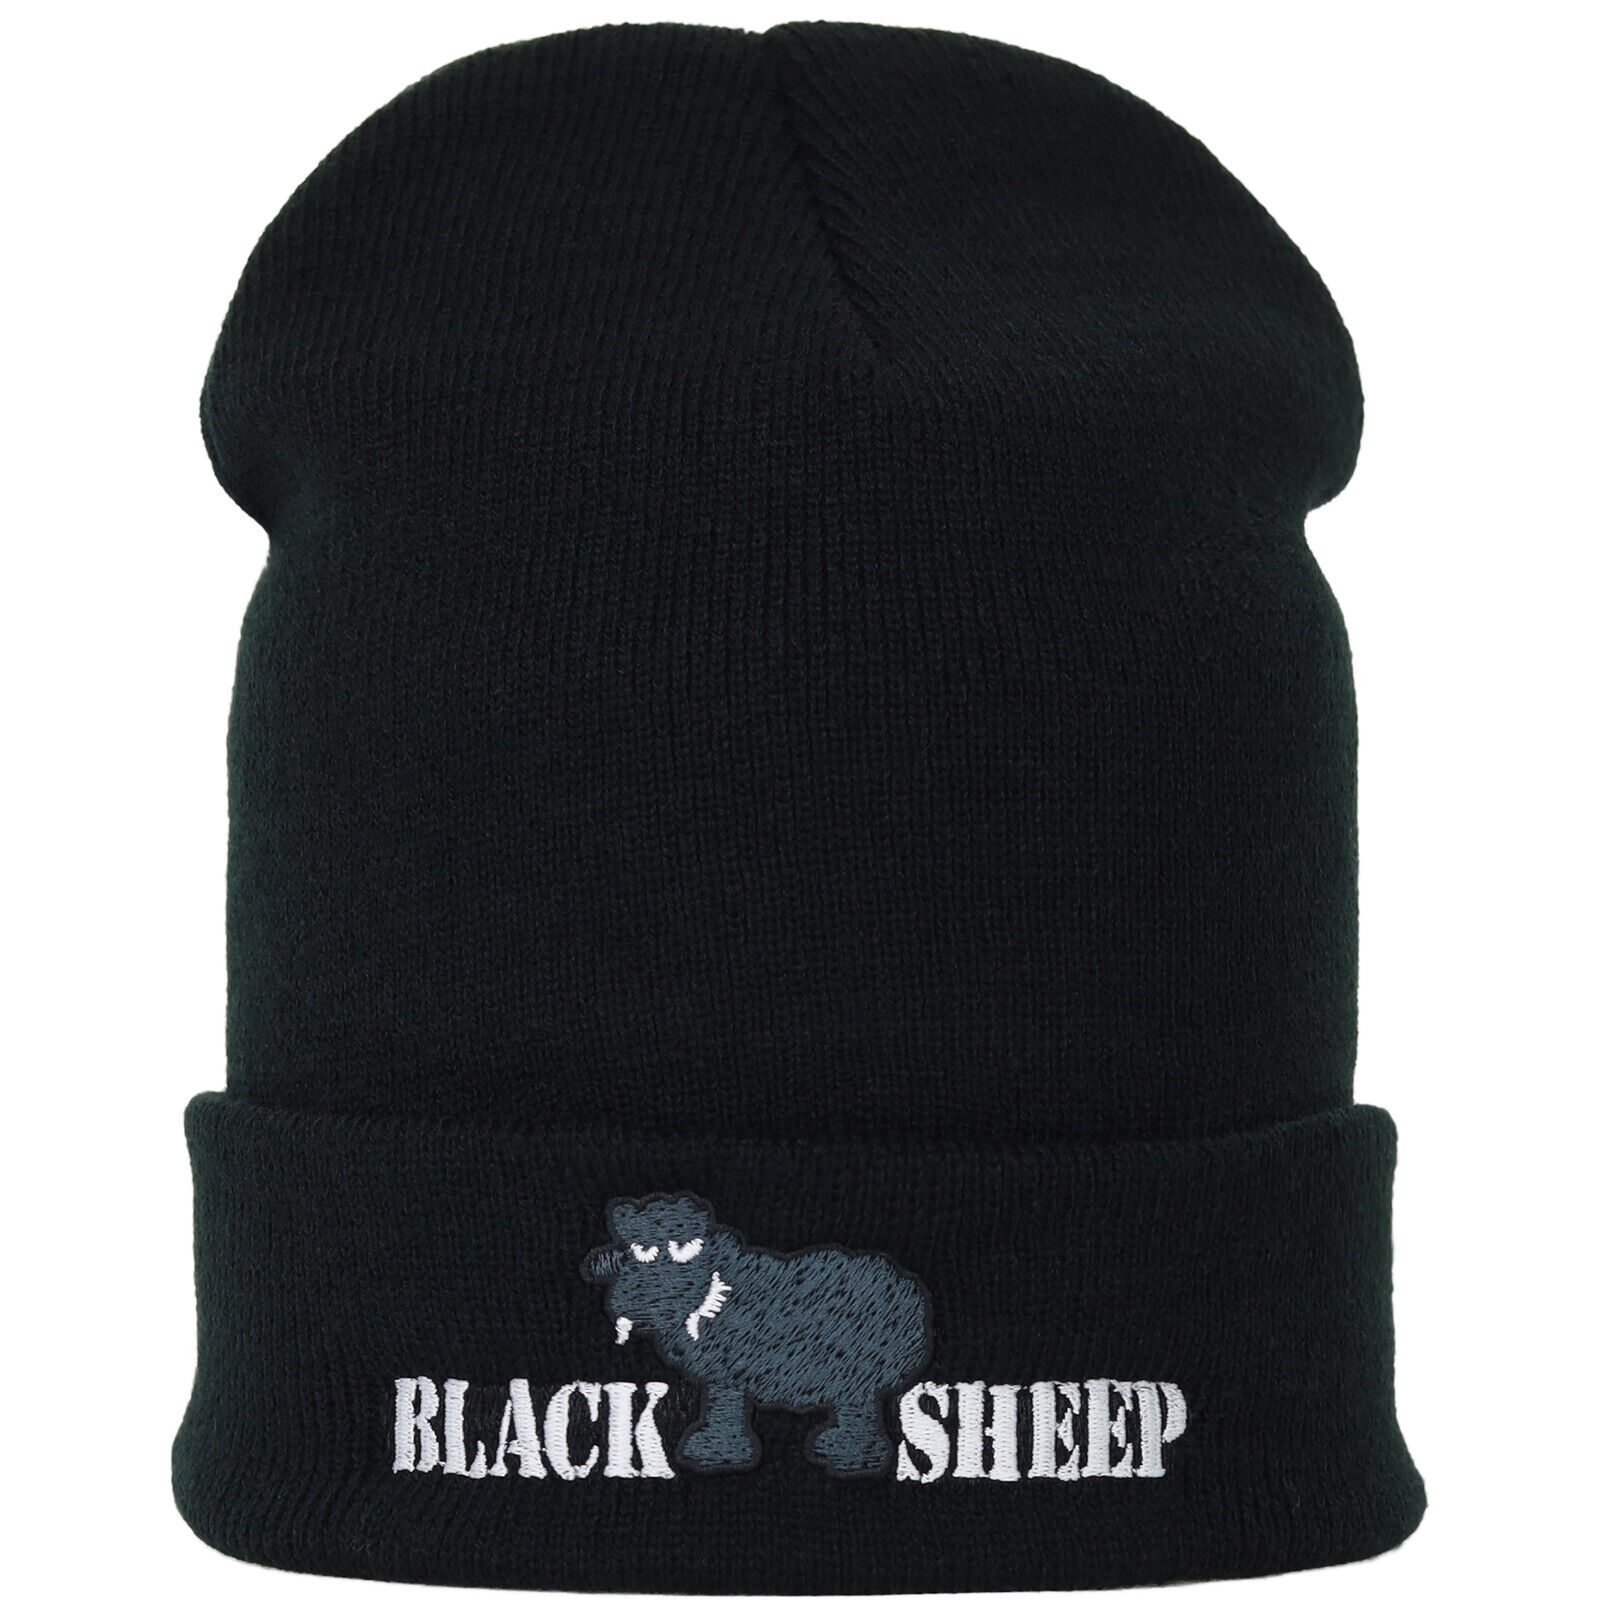 Black Sheep Knitted Hat Funny Wool Hat Bonnet Beanie Winter Unisex Ladies/Mens